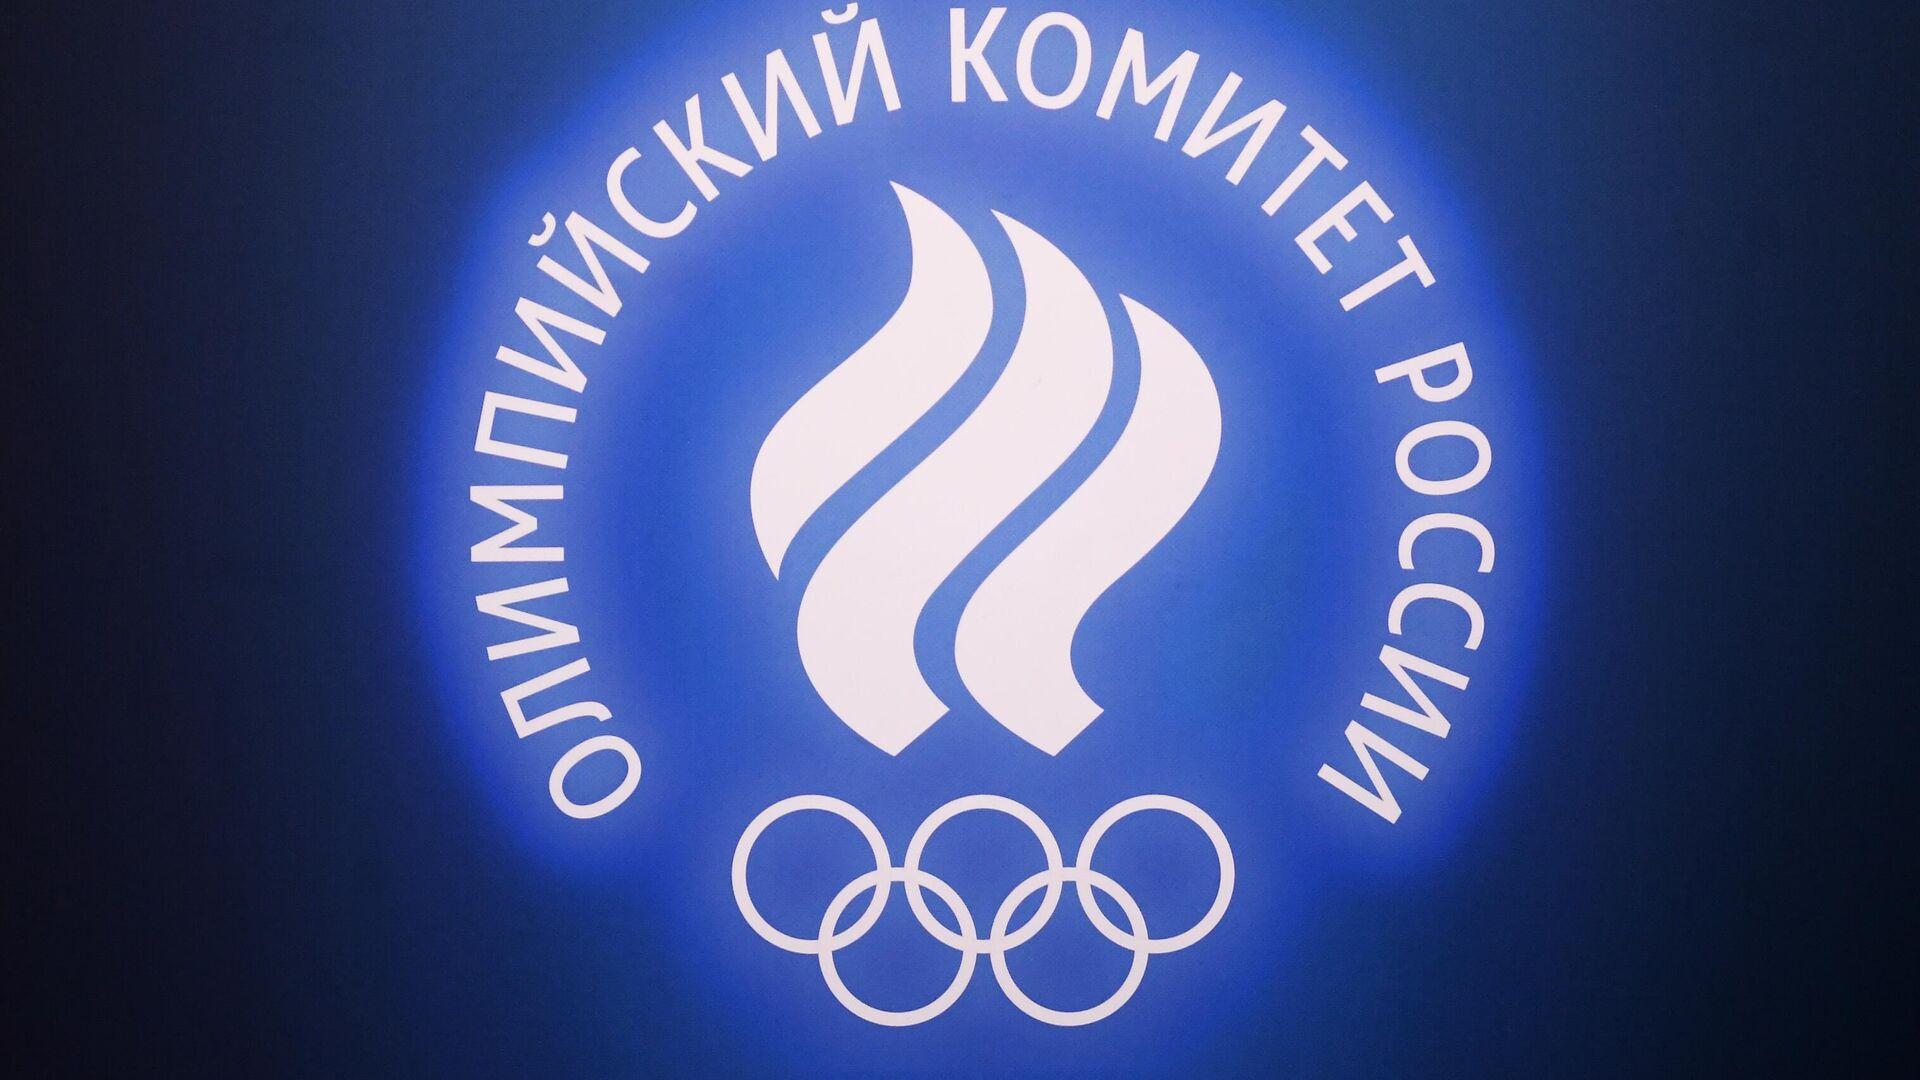 Символика Олимпийского комитета России (ОКР) - РИА Новости, 1920, 22.04.2021